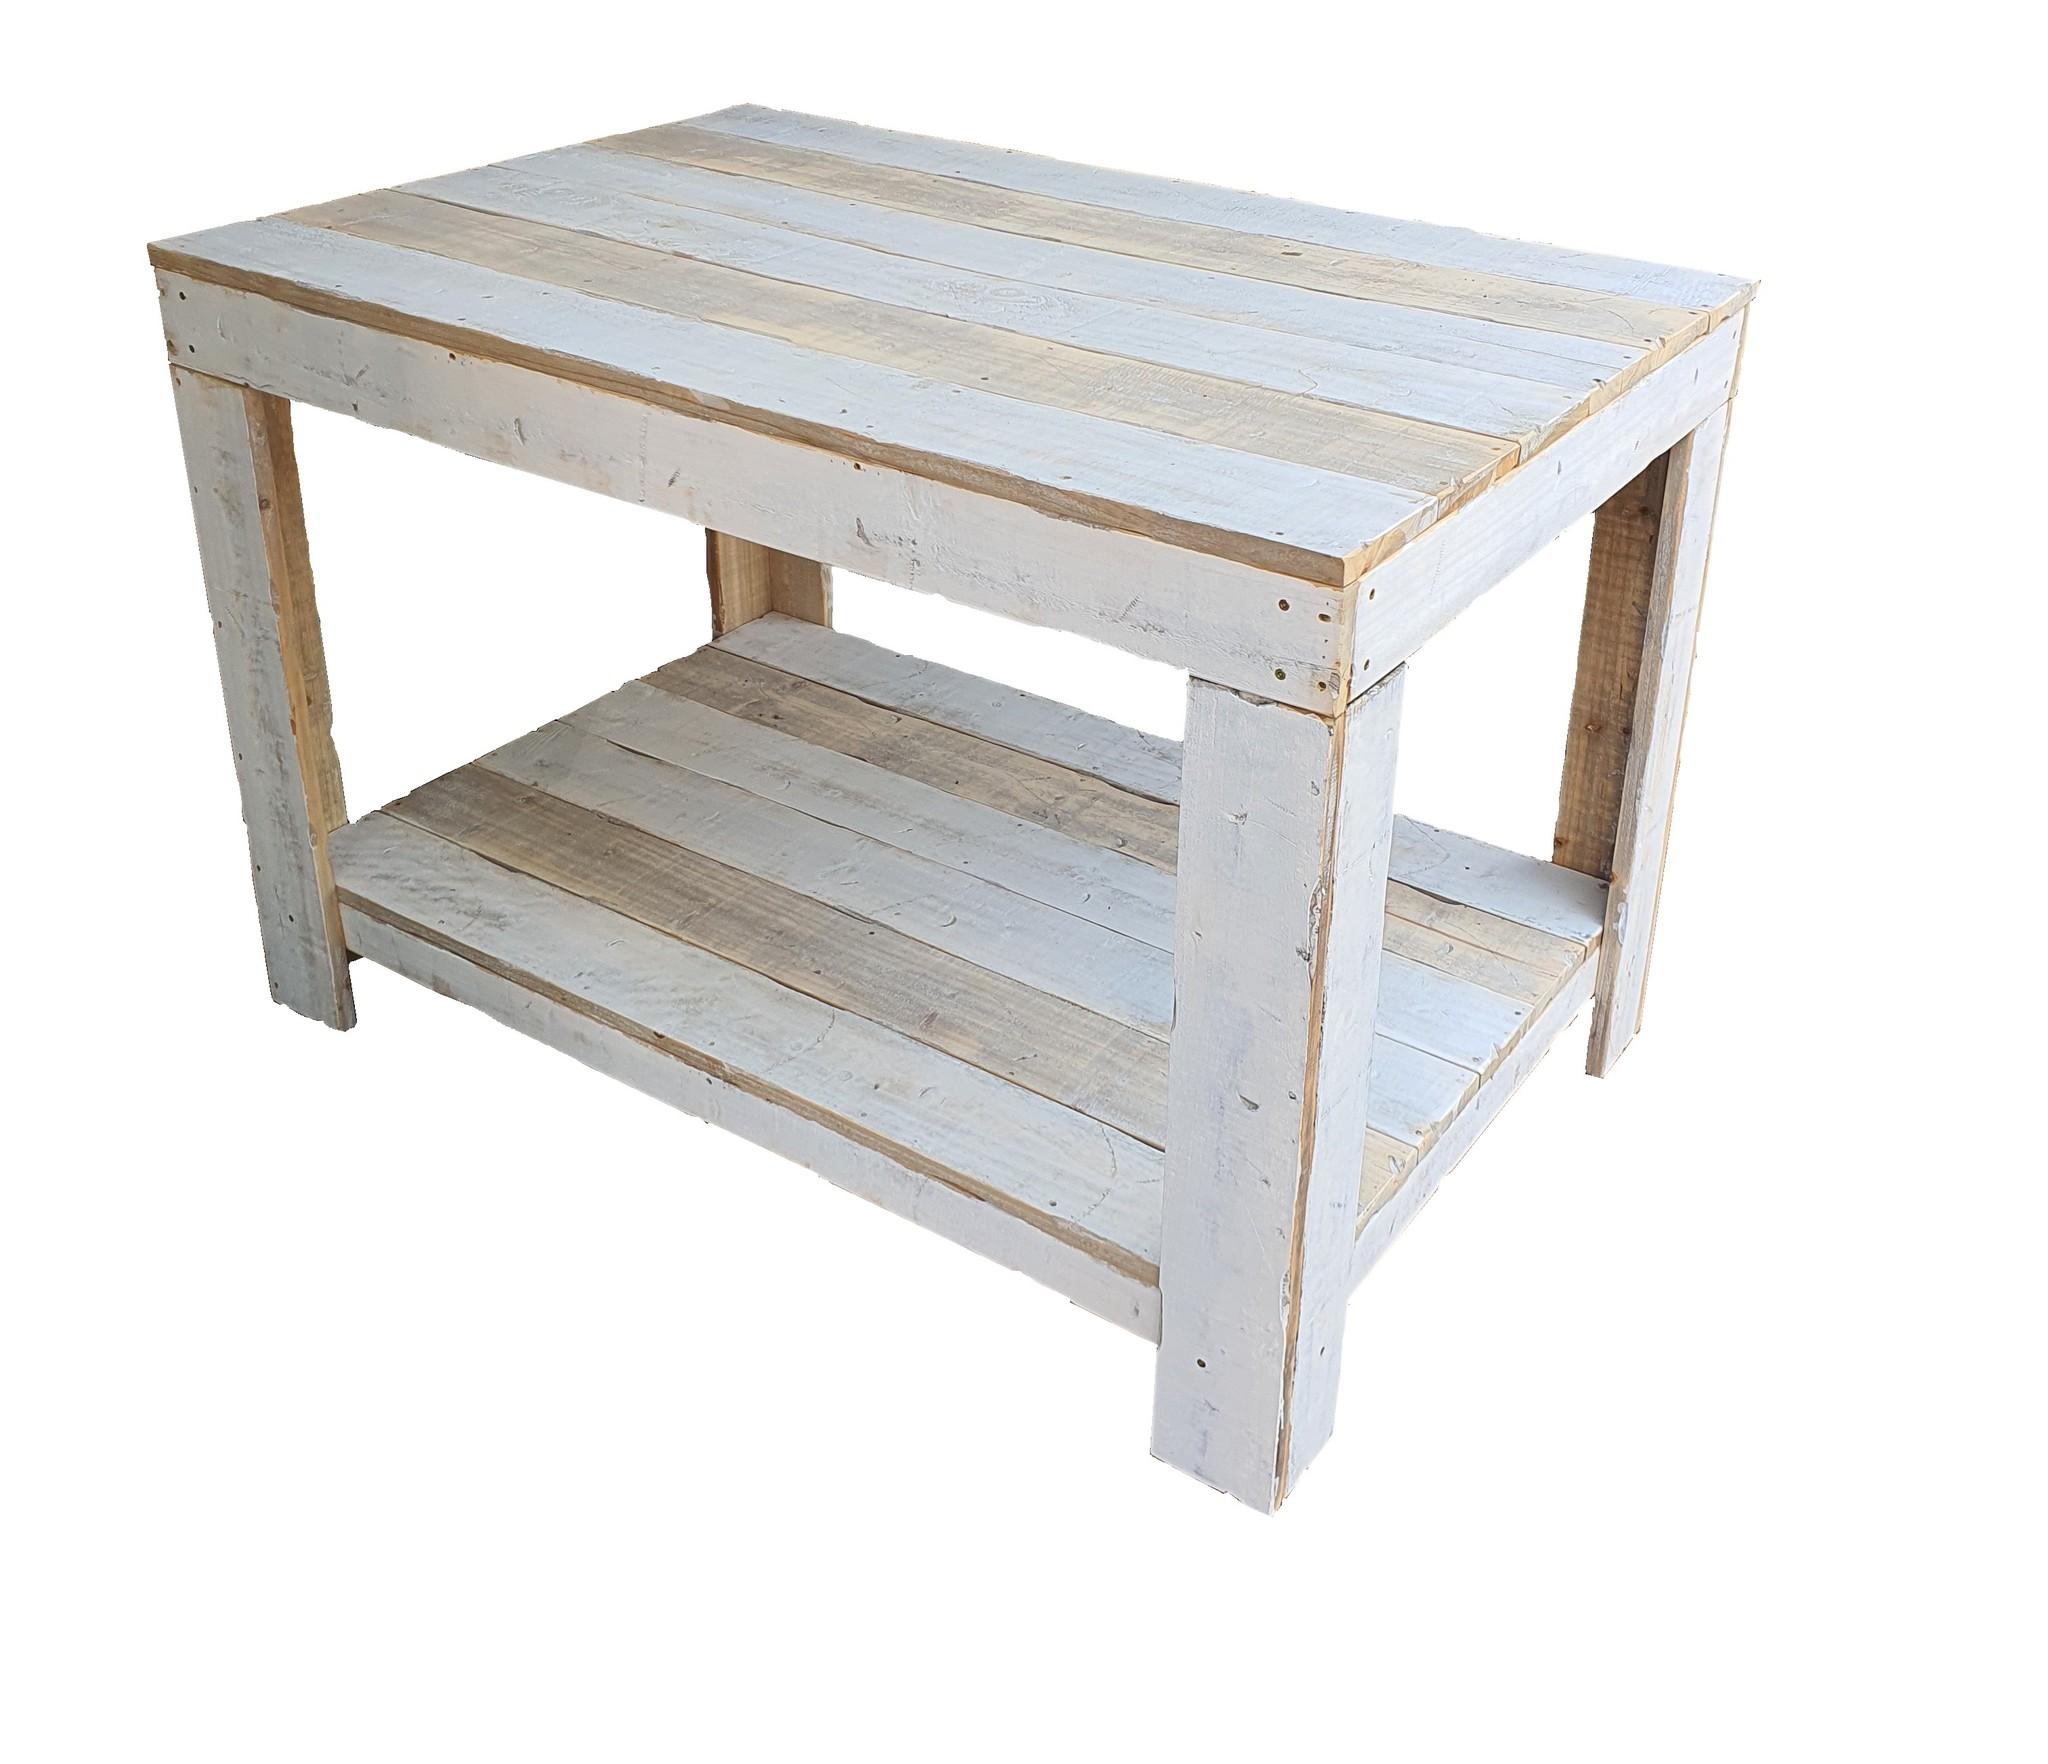 shop int ibiza white table double 110-2